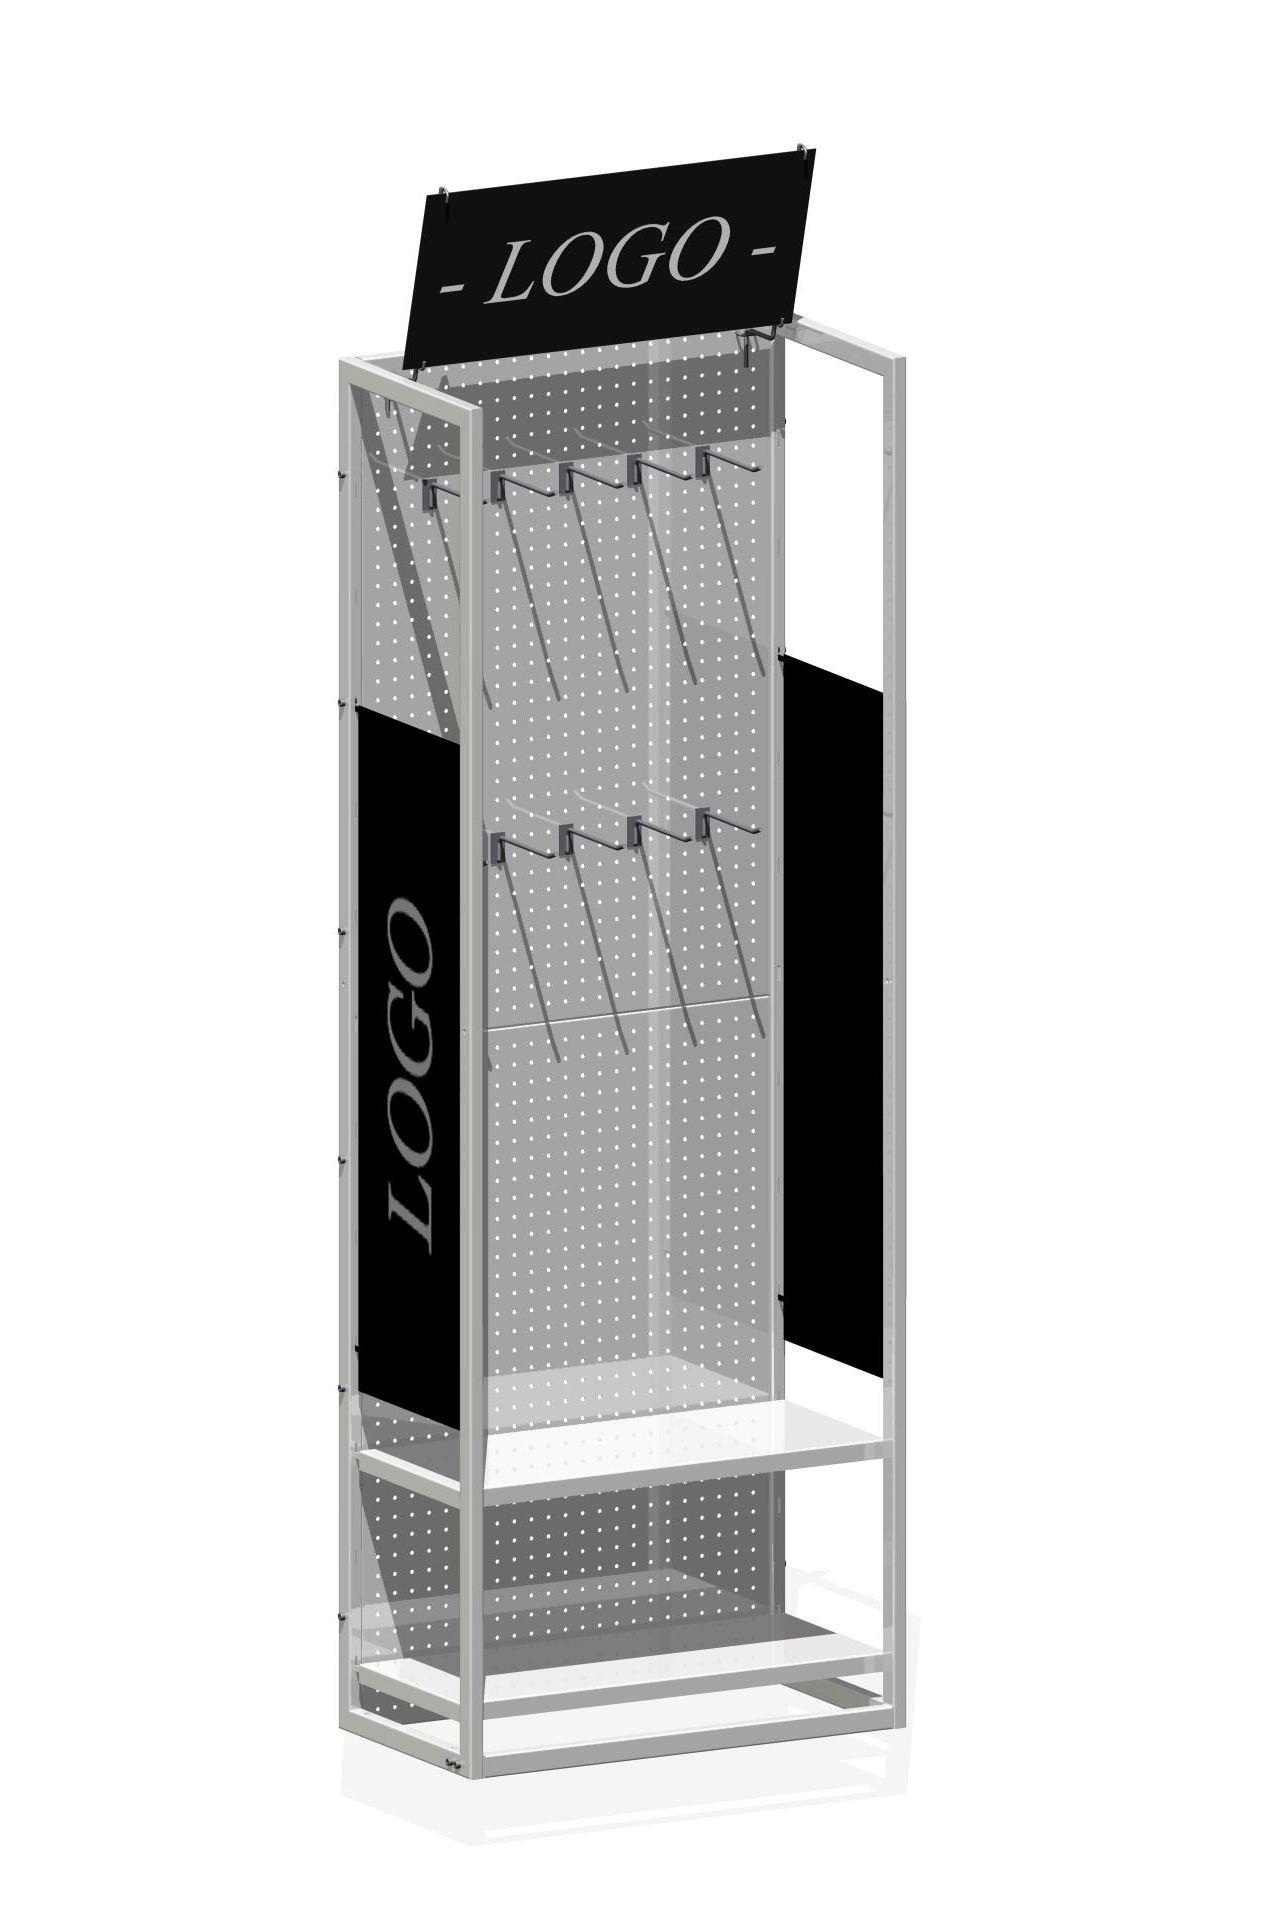 bu 1311 08 90 5 buyck displays. Black Bedroom Furniture Sets. Home Design Ideas